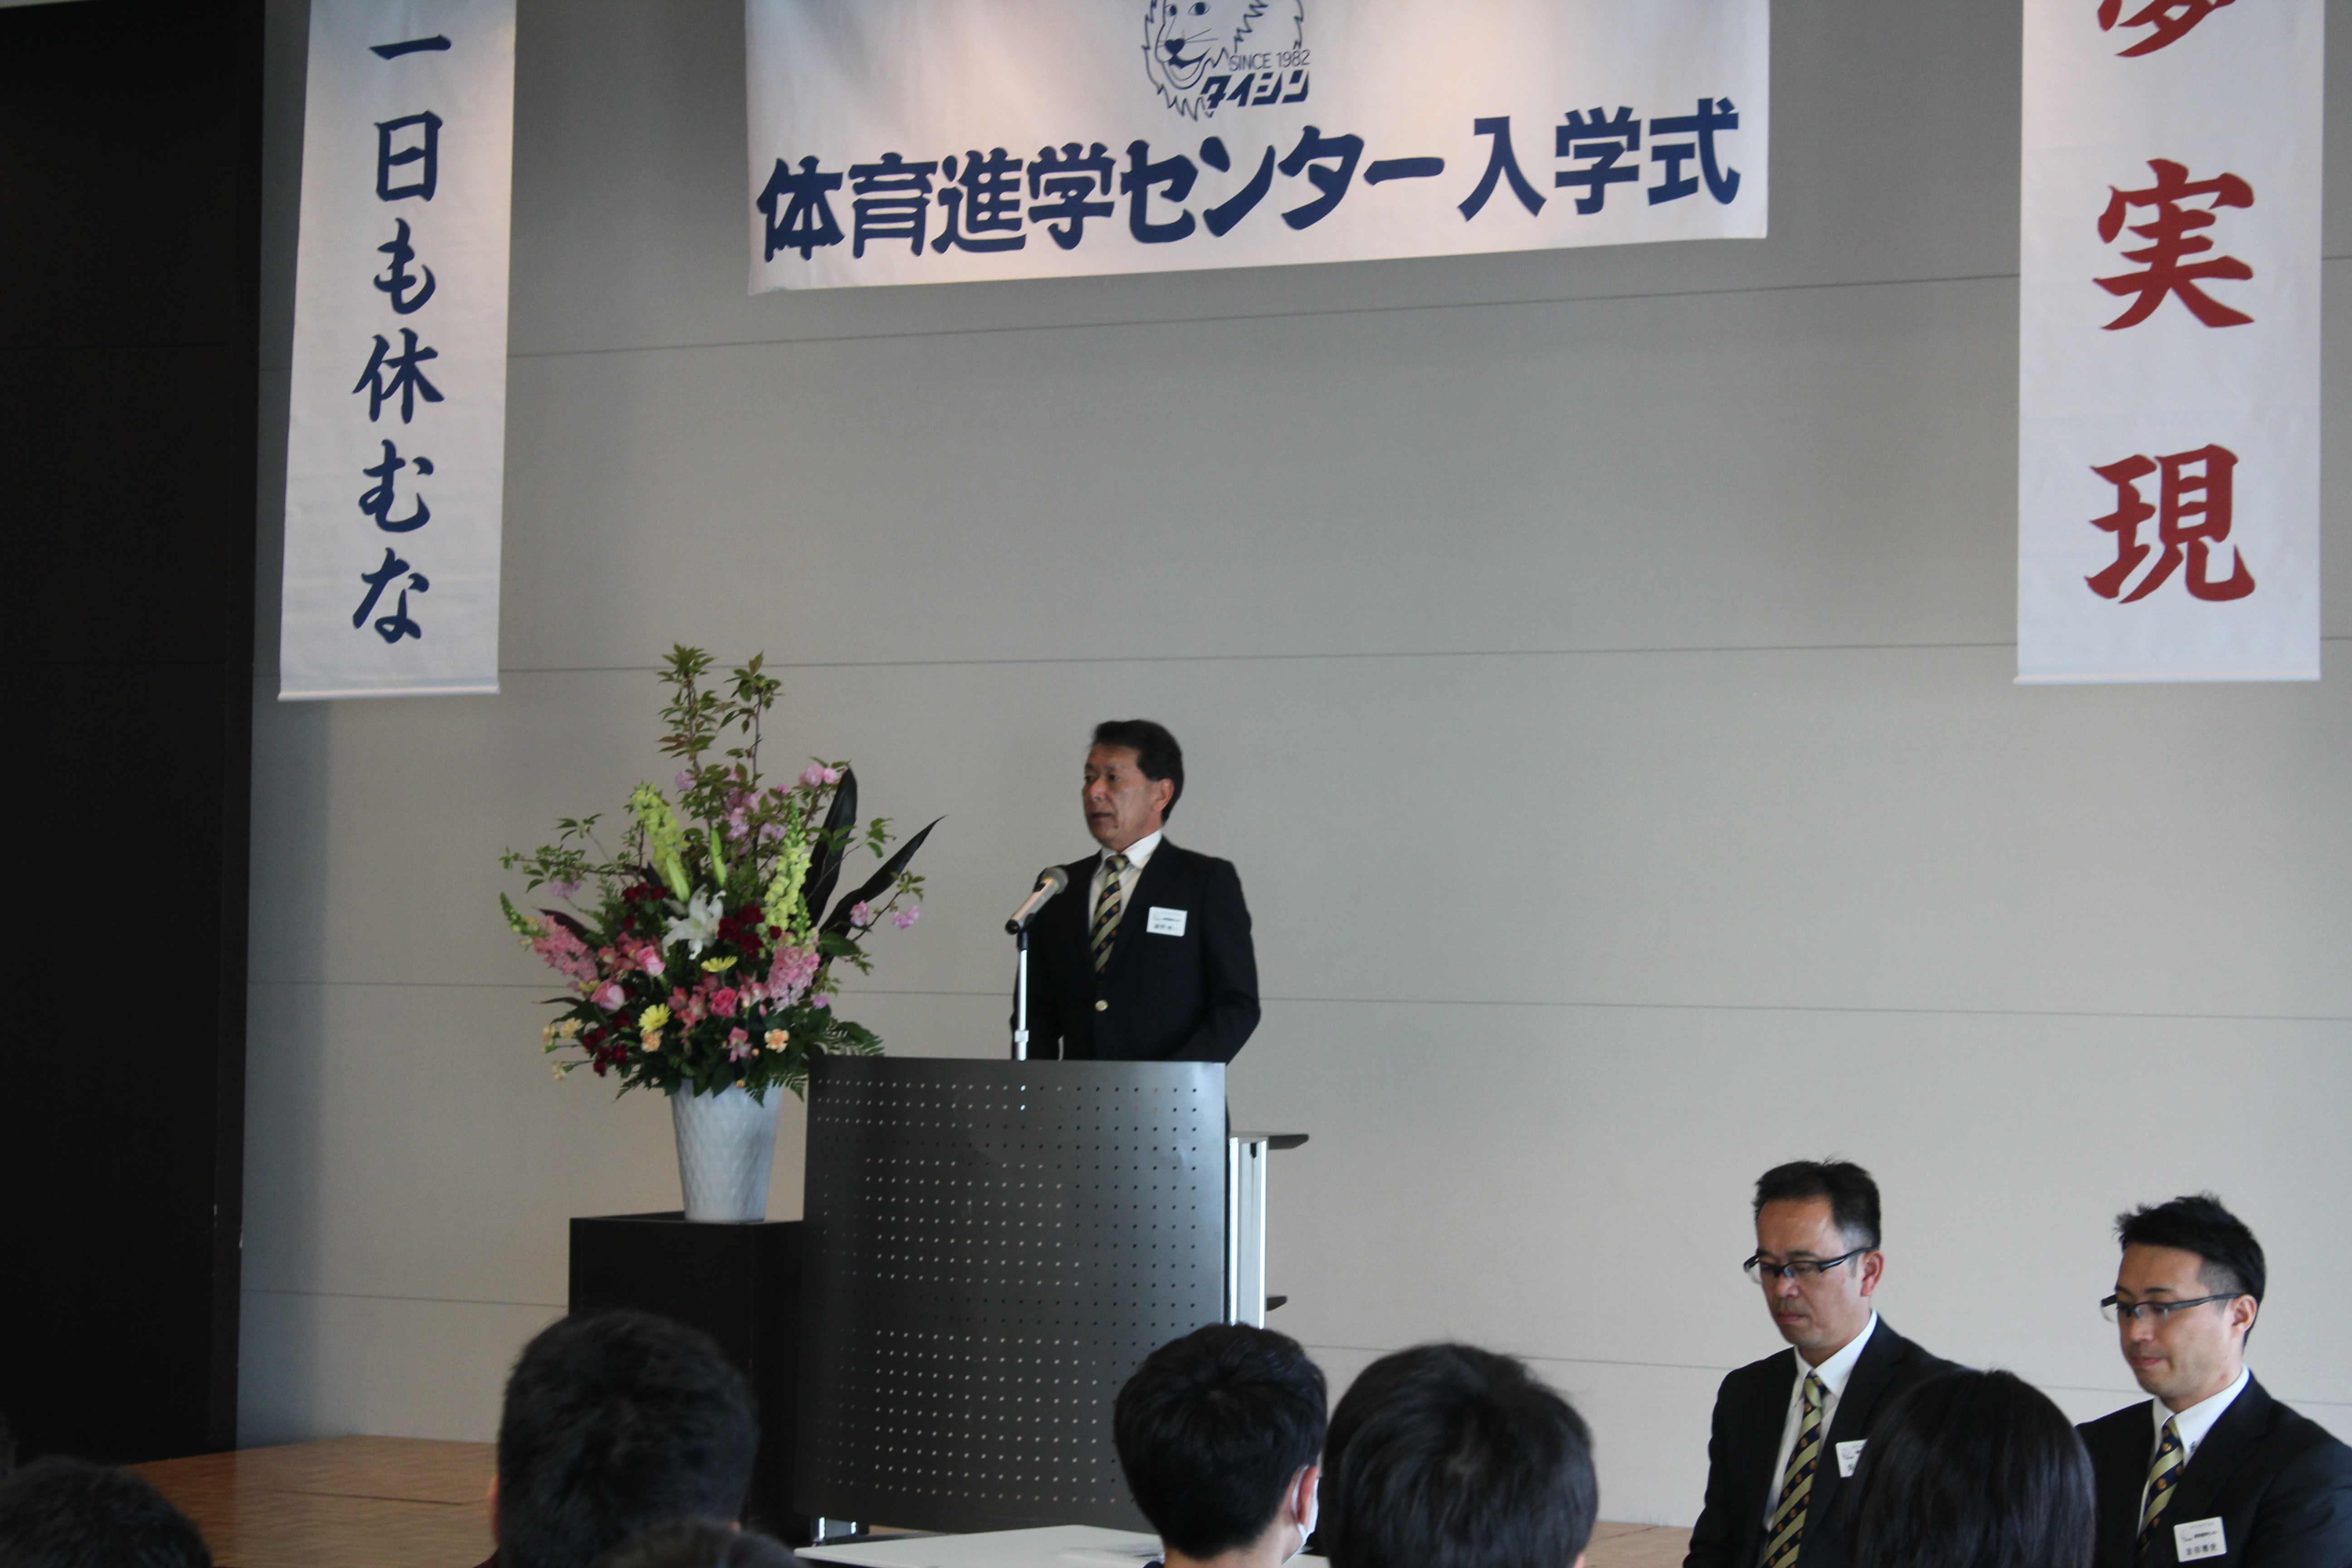 hatano421入学式1.jpg